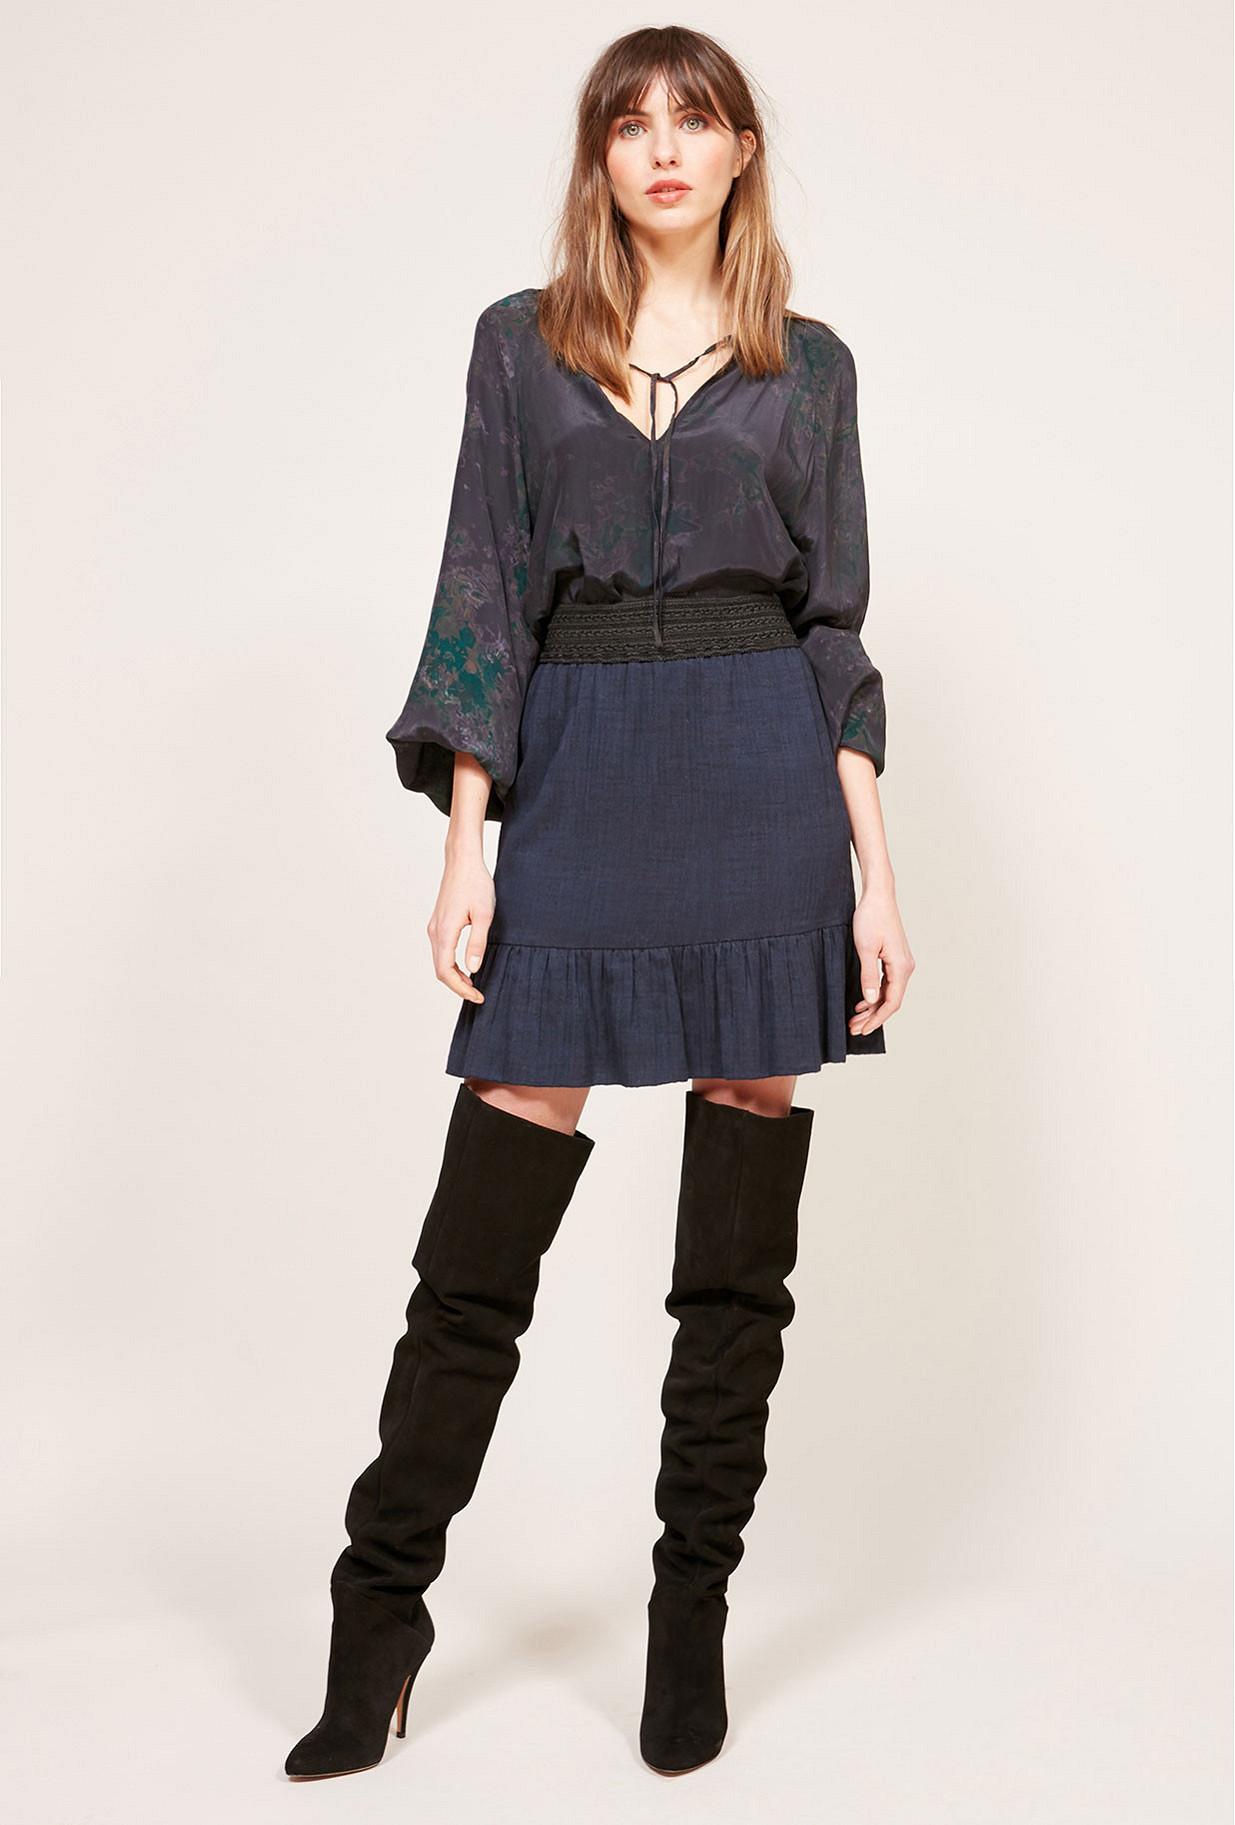 Paris clothes store Skirt  Babko french designer fashion Paris